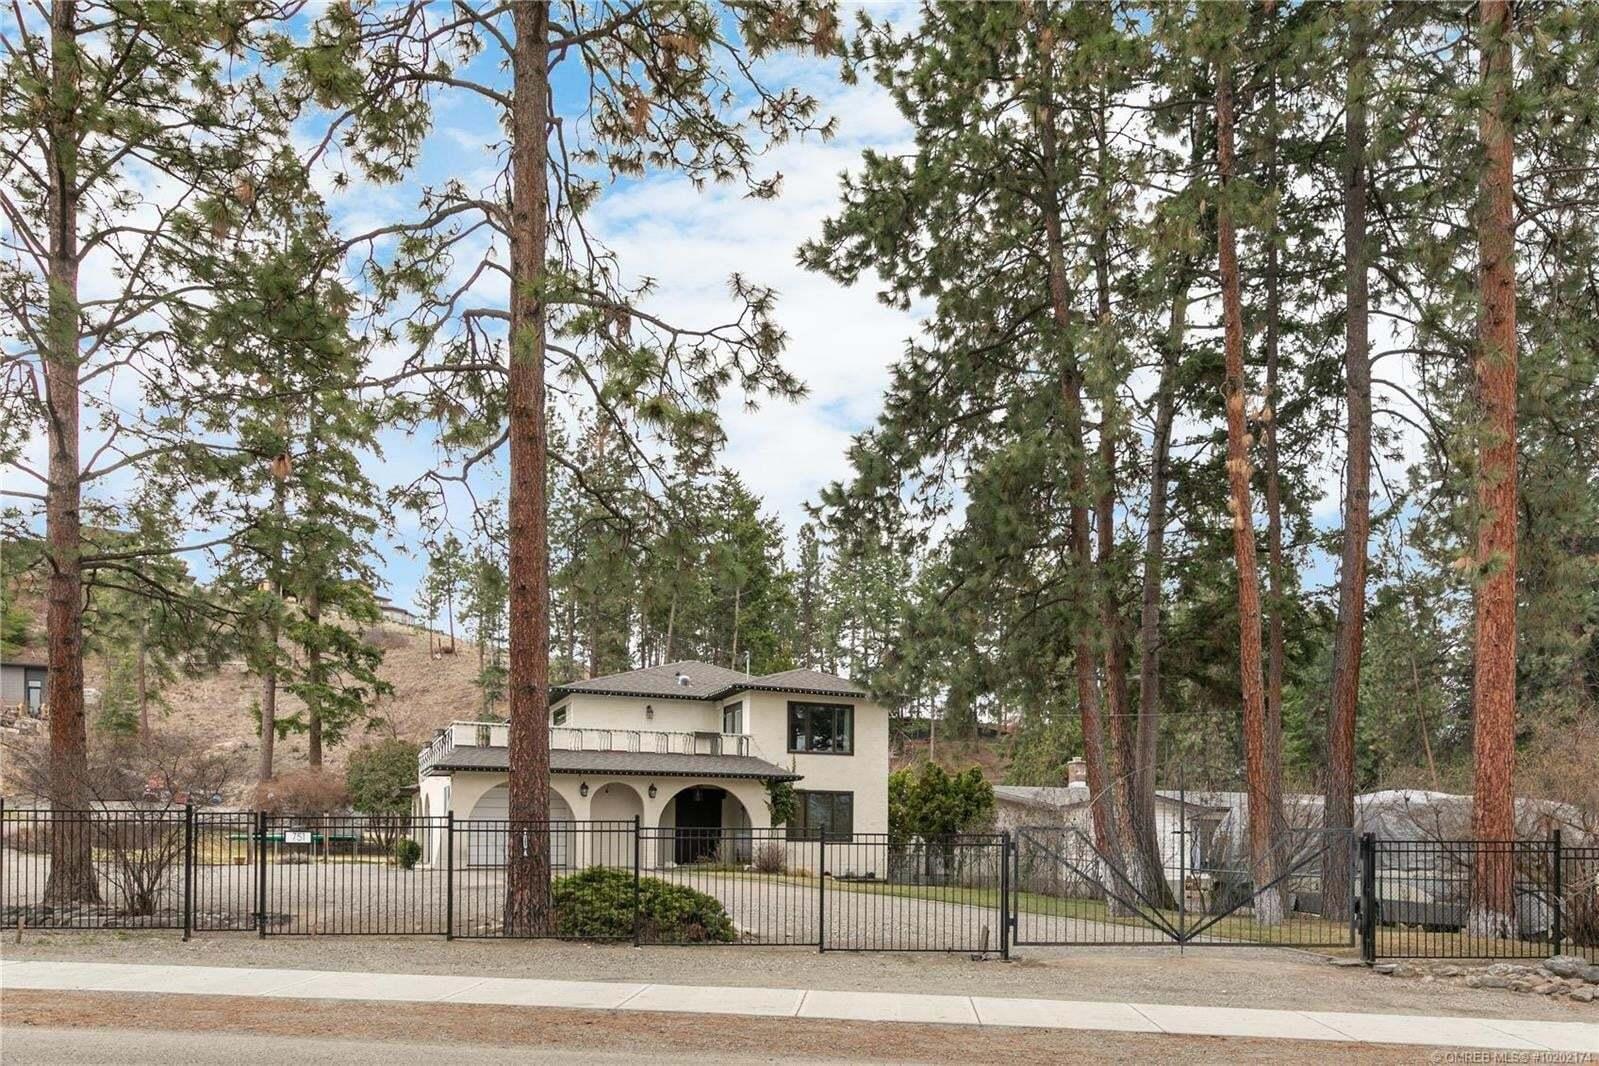 House for sale at 751 Barnaby Rd Kelowna British Columbia - MLS: 10202174